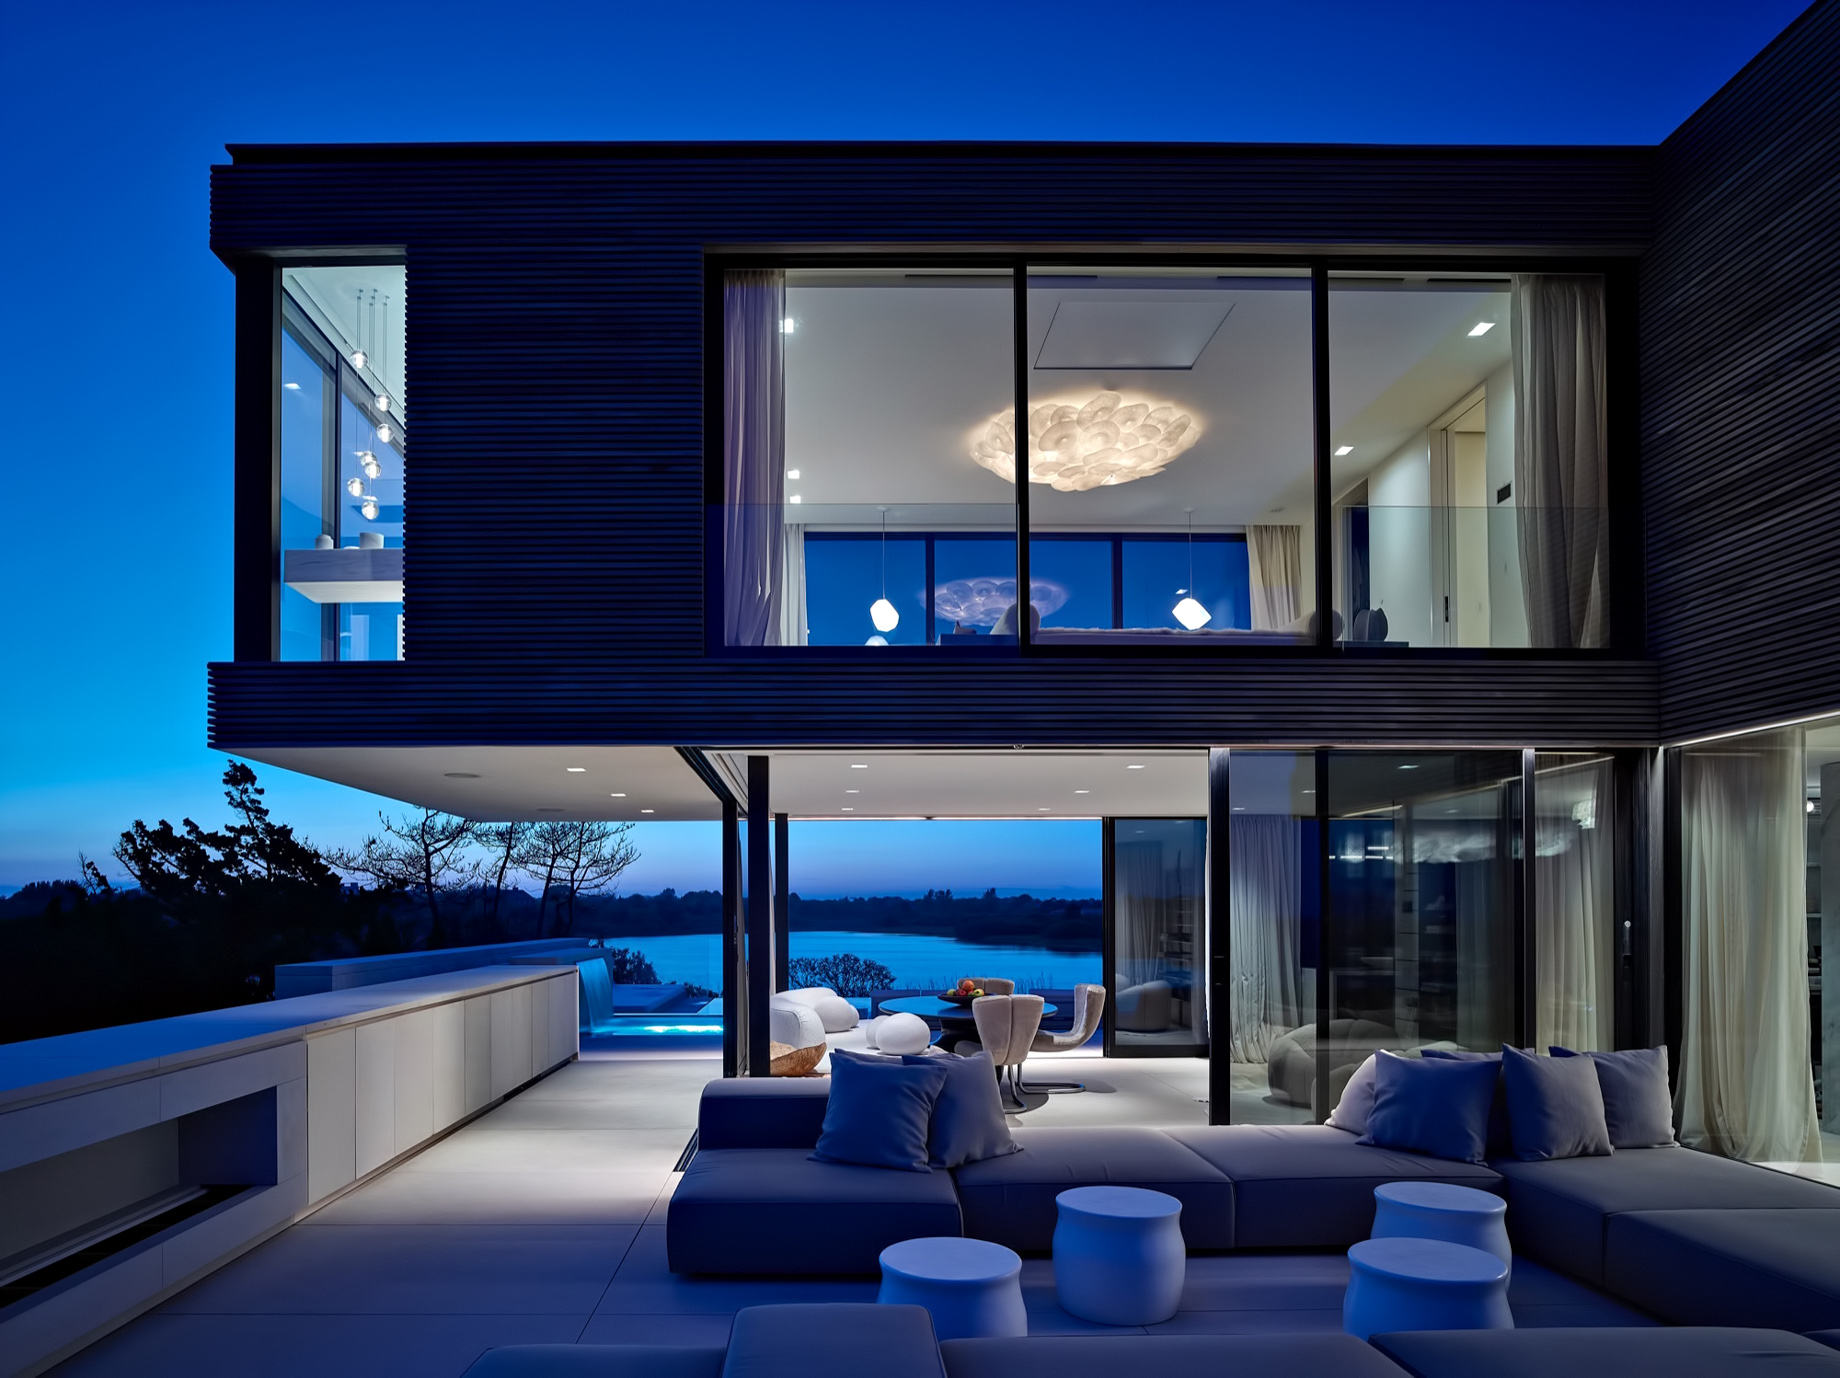 Field House Residence - Fairfield Pond Ln, Sagaponack, NY, USA